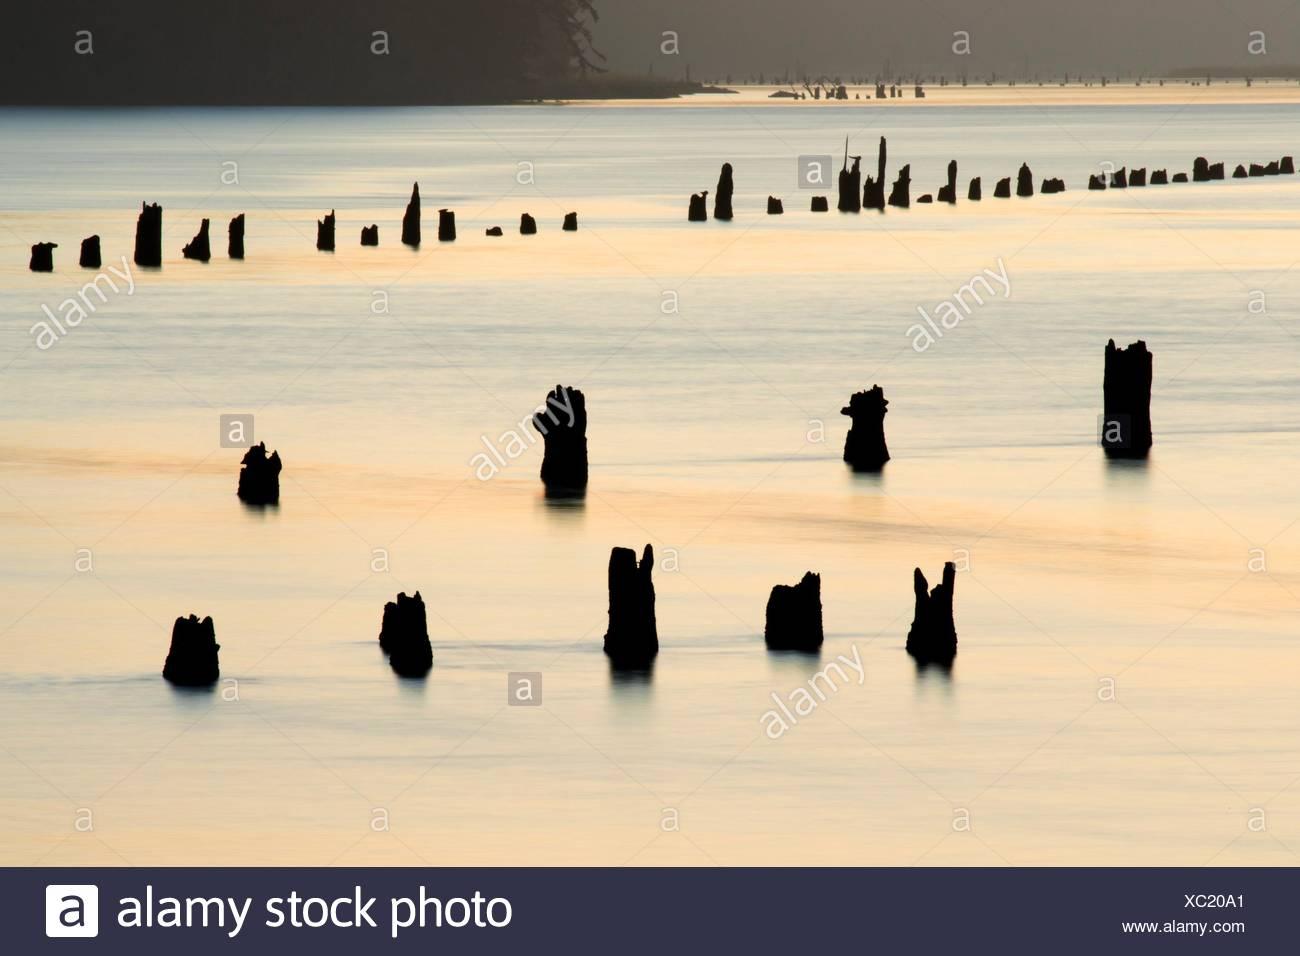 Pfähle in Siuslaw Bay, Florence, Oregon. Stockbild